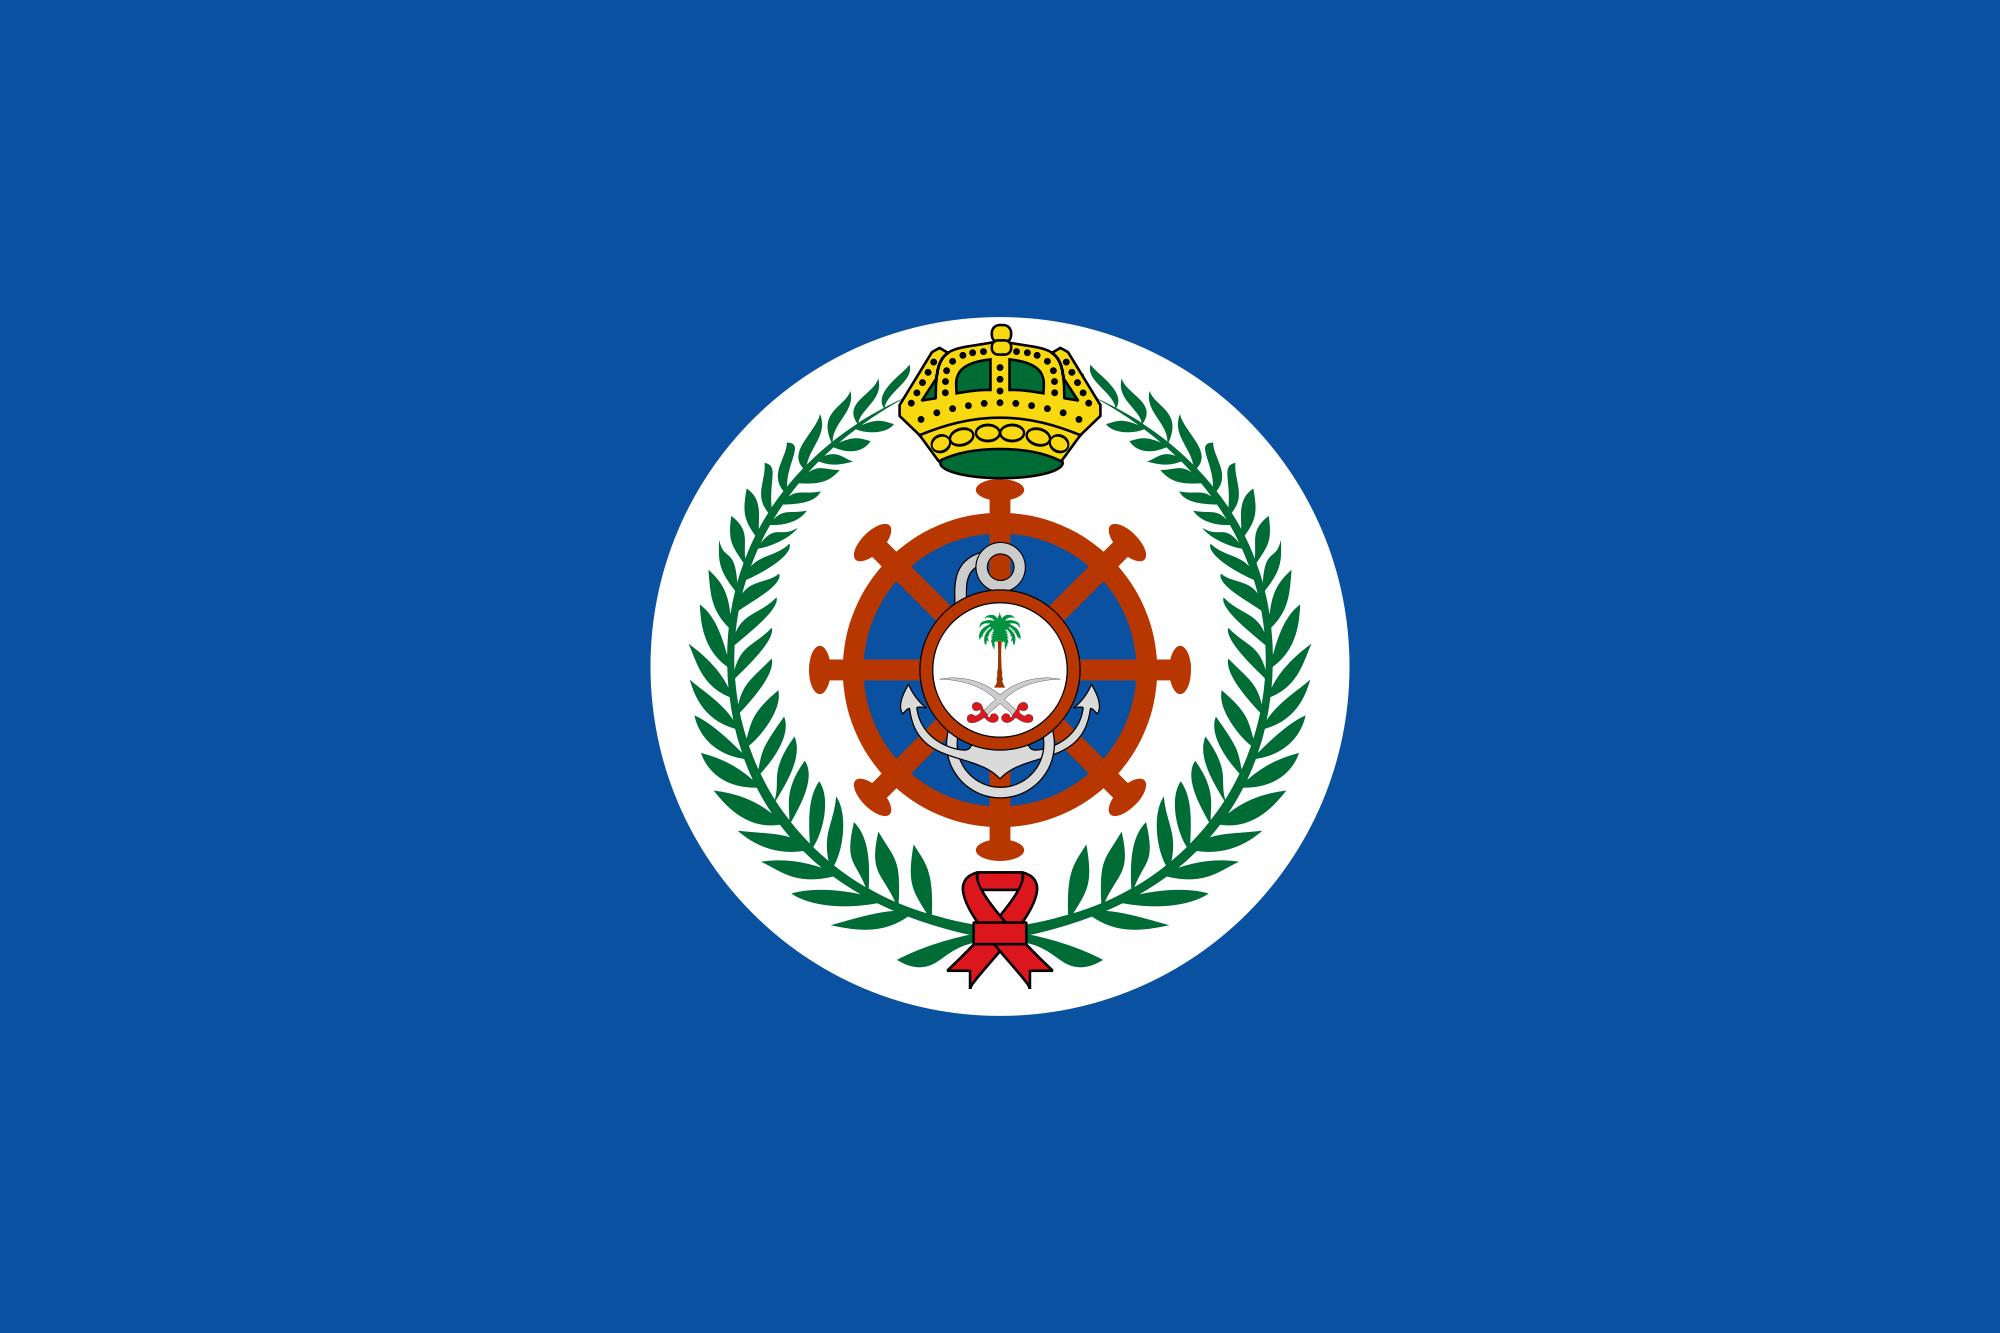 Saudi Arabia (Naval Jack)